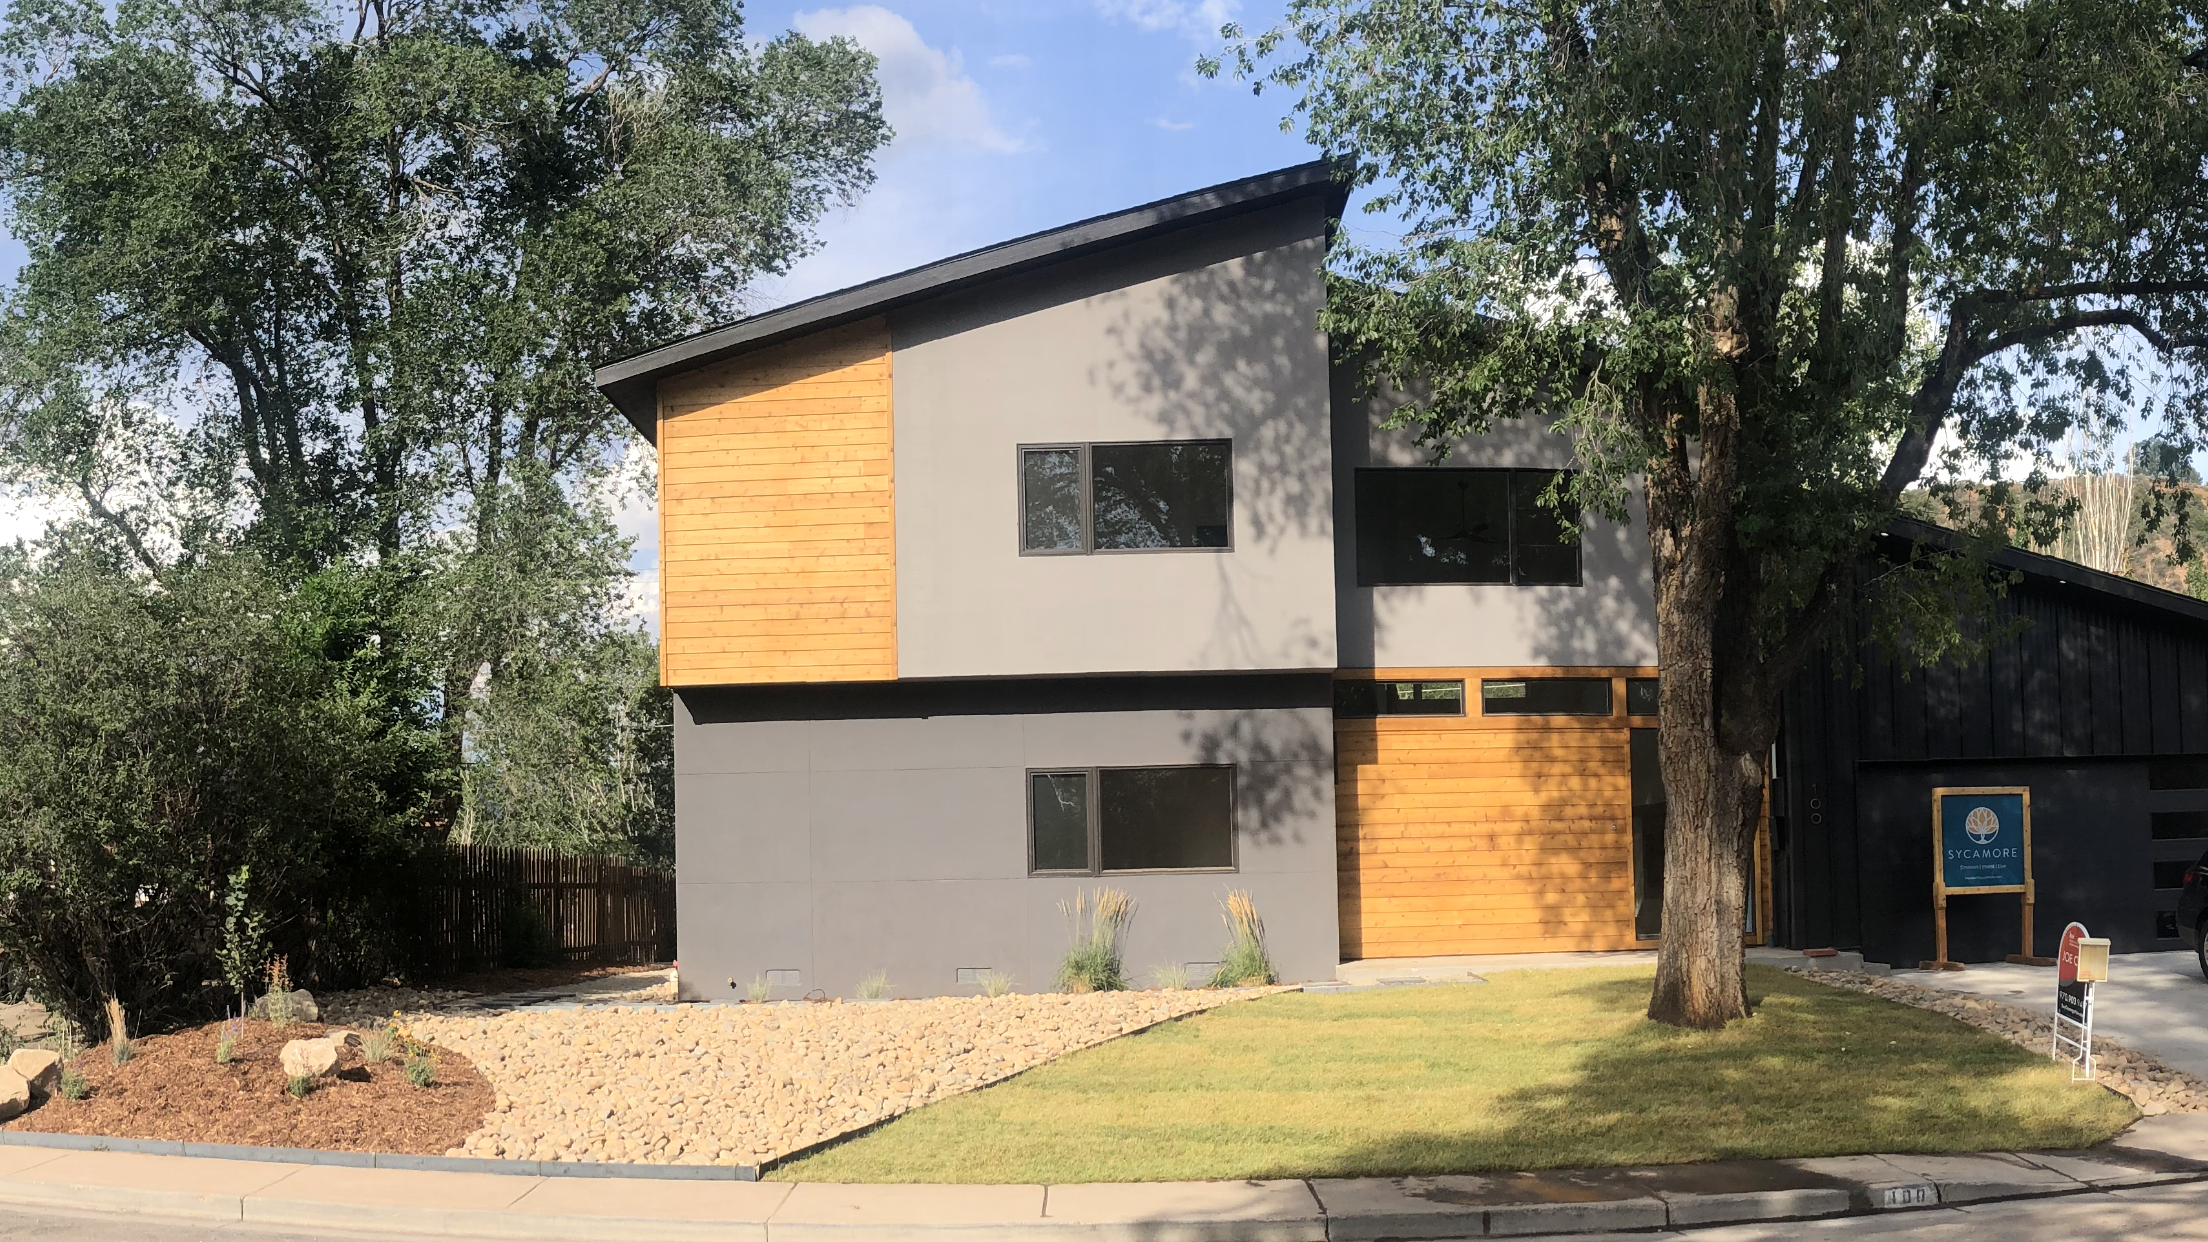 landscaping Build, 100 riverview drive, Durango Colorado